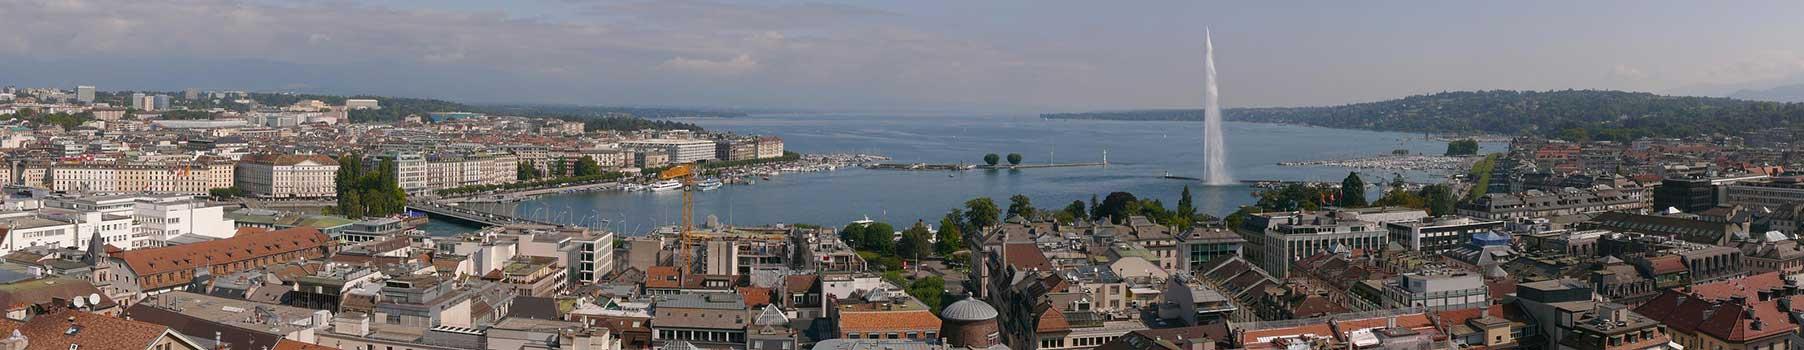 Removals to Geneva - Removals to Switzerland